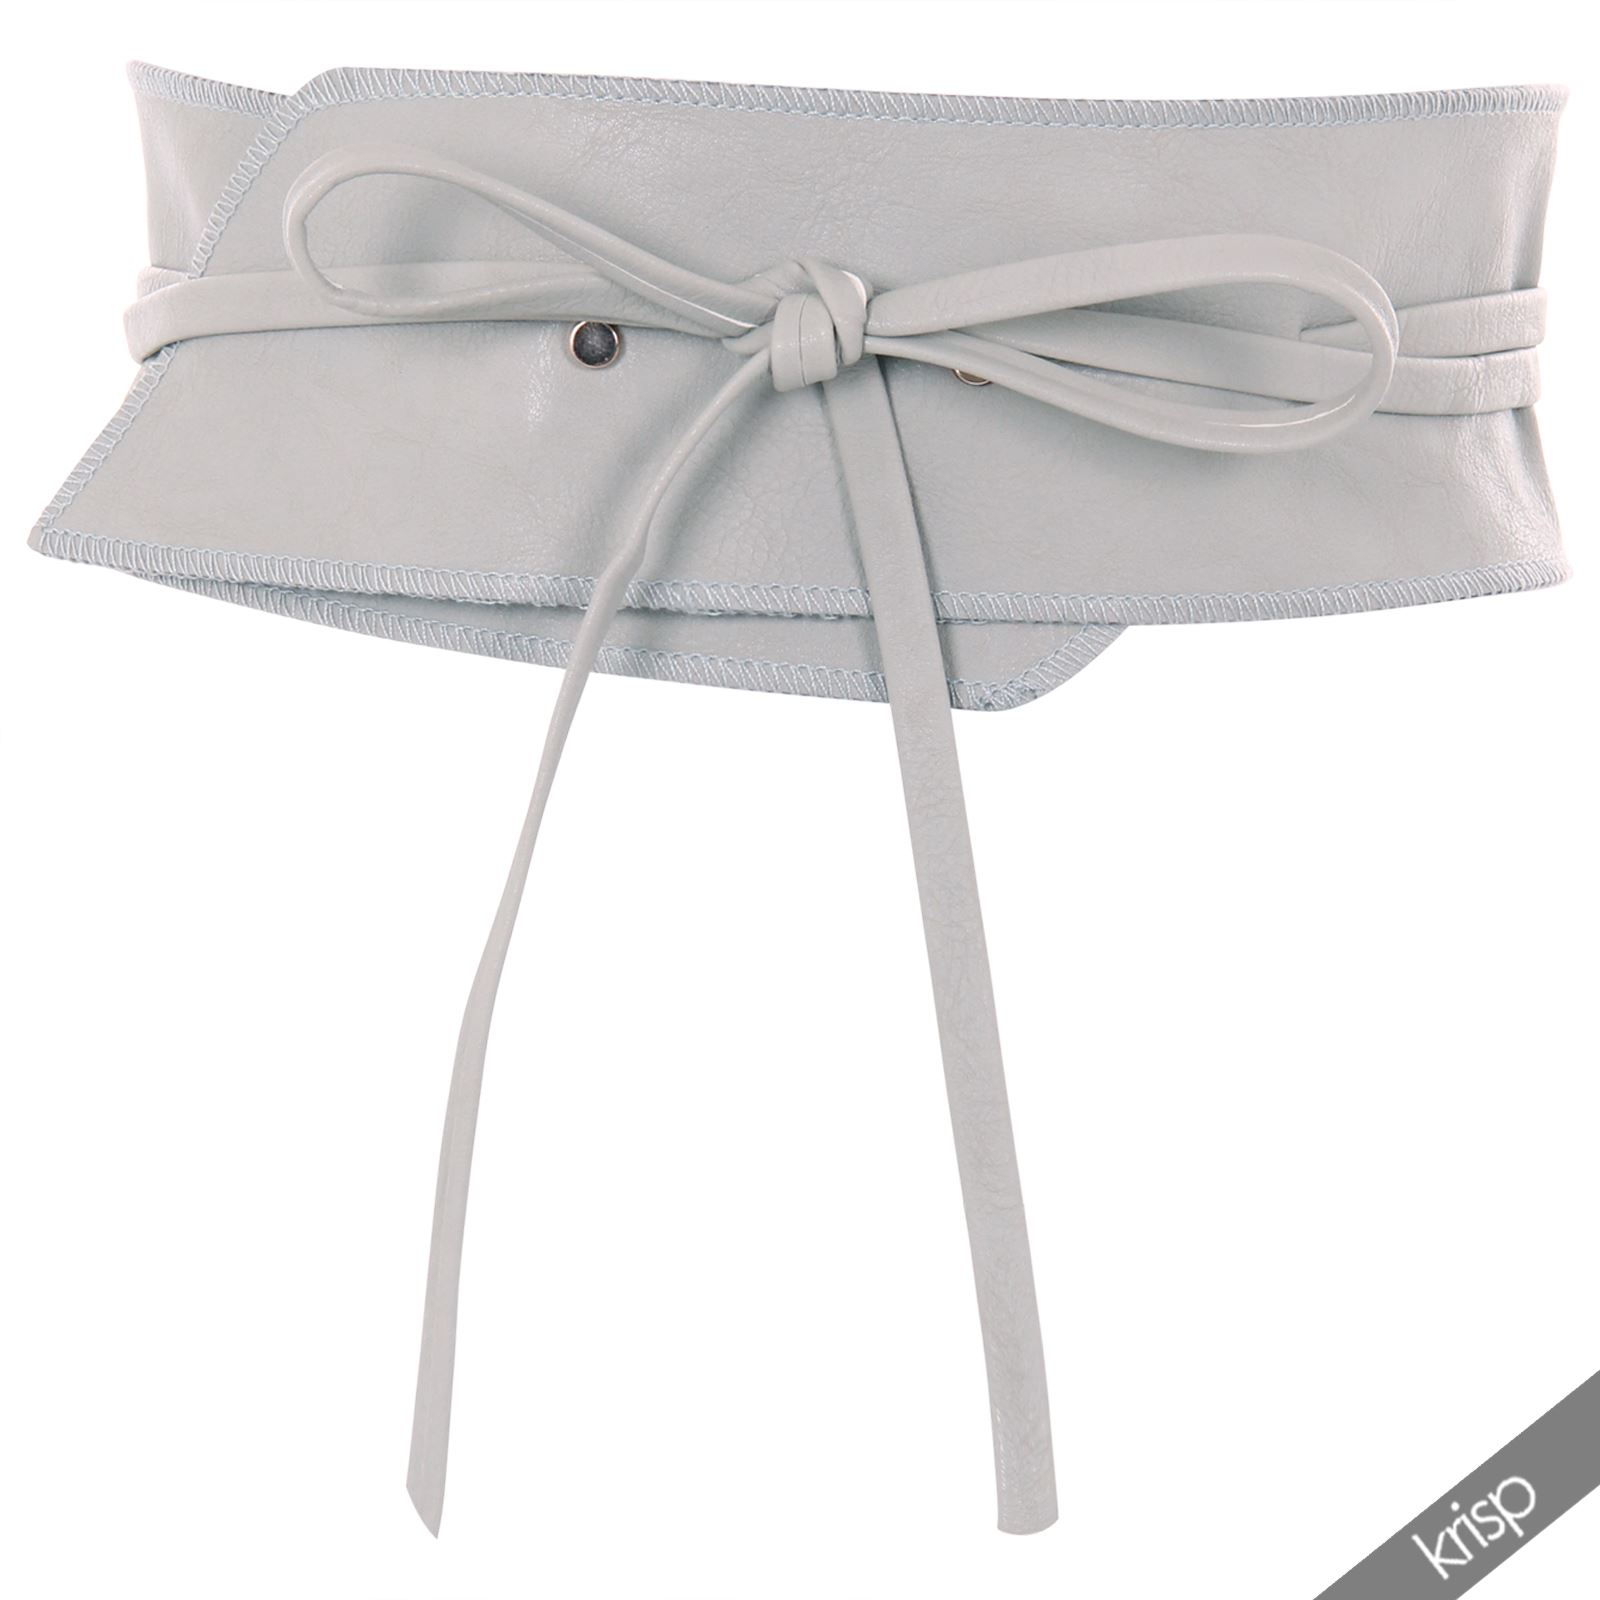 Tie wrap en francais